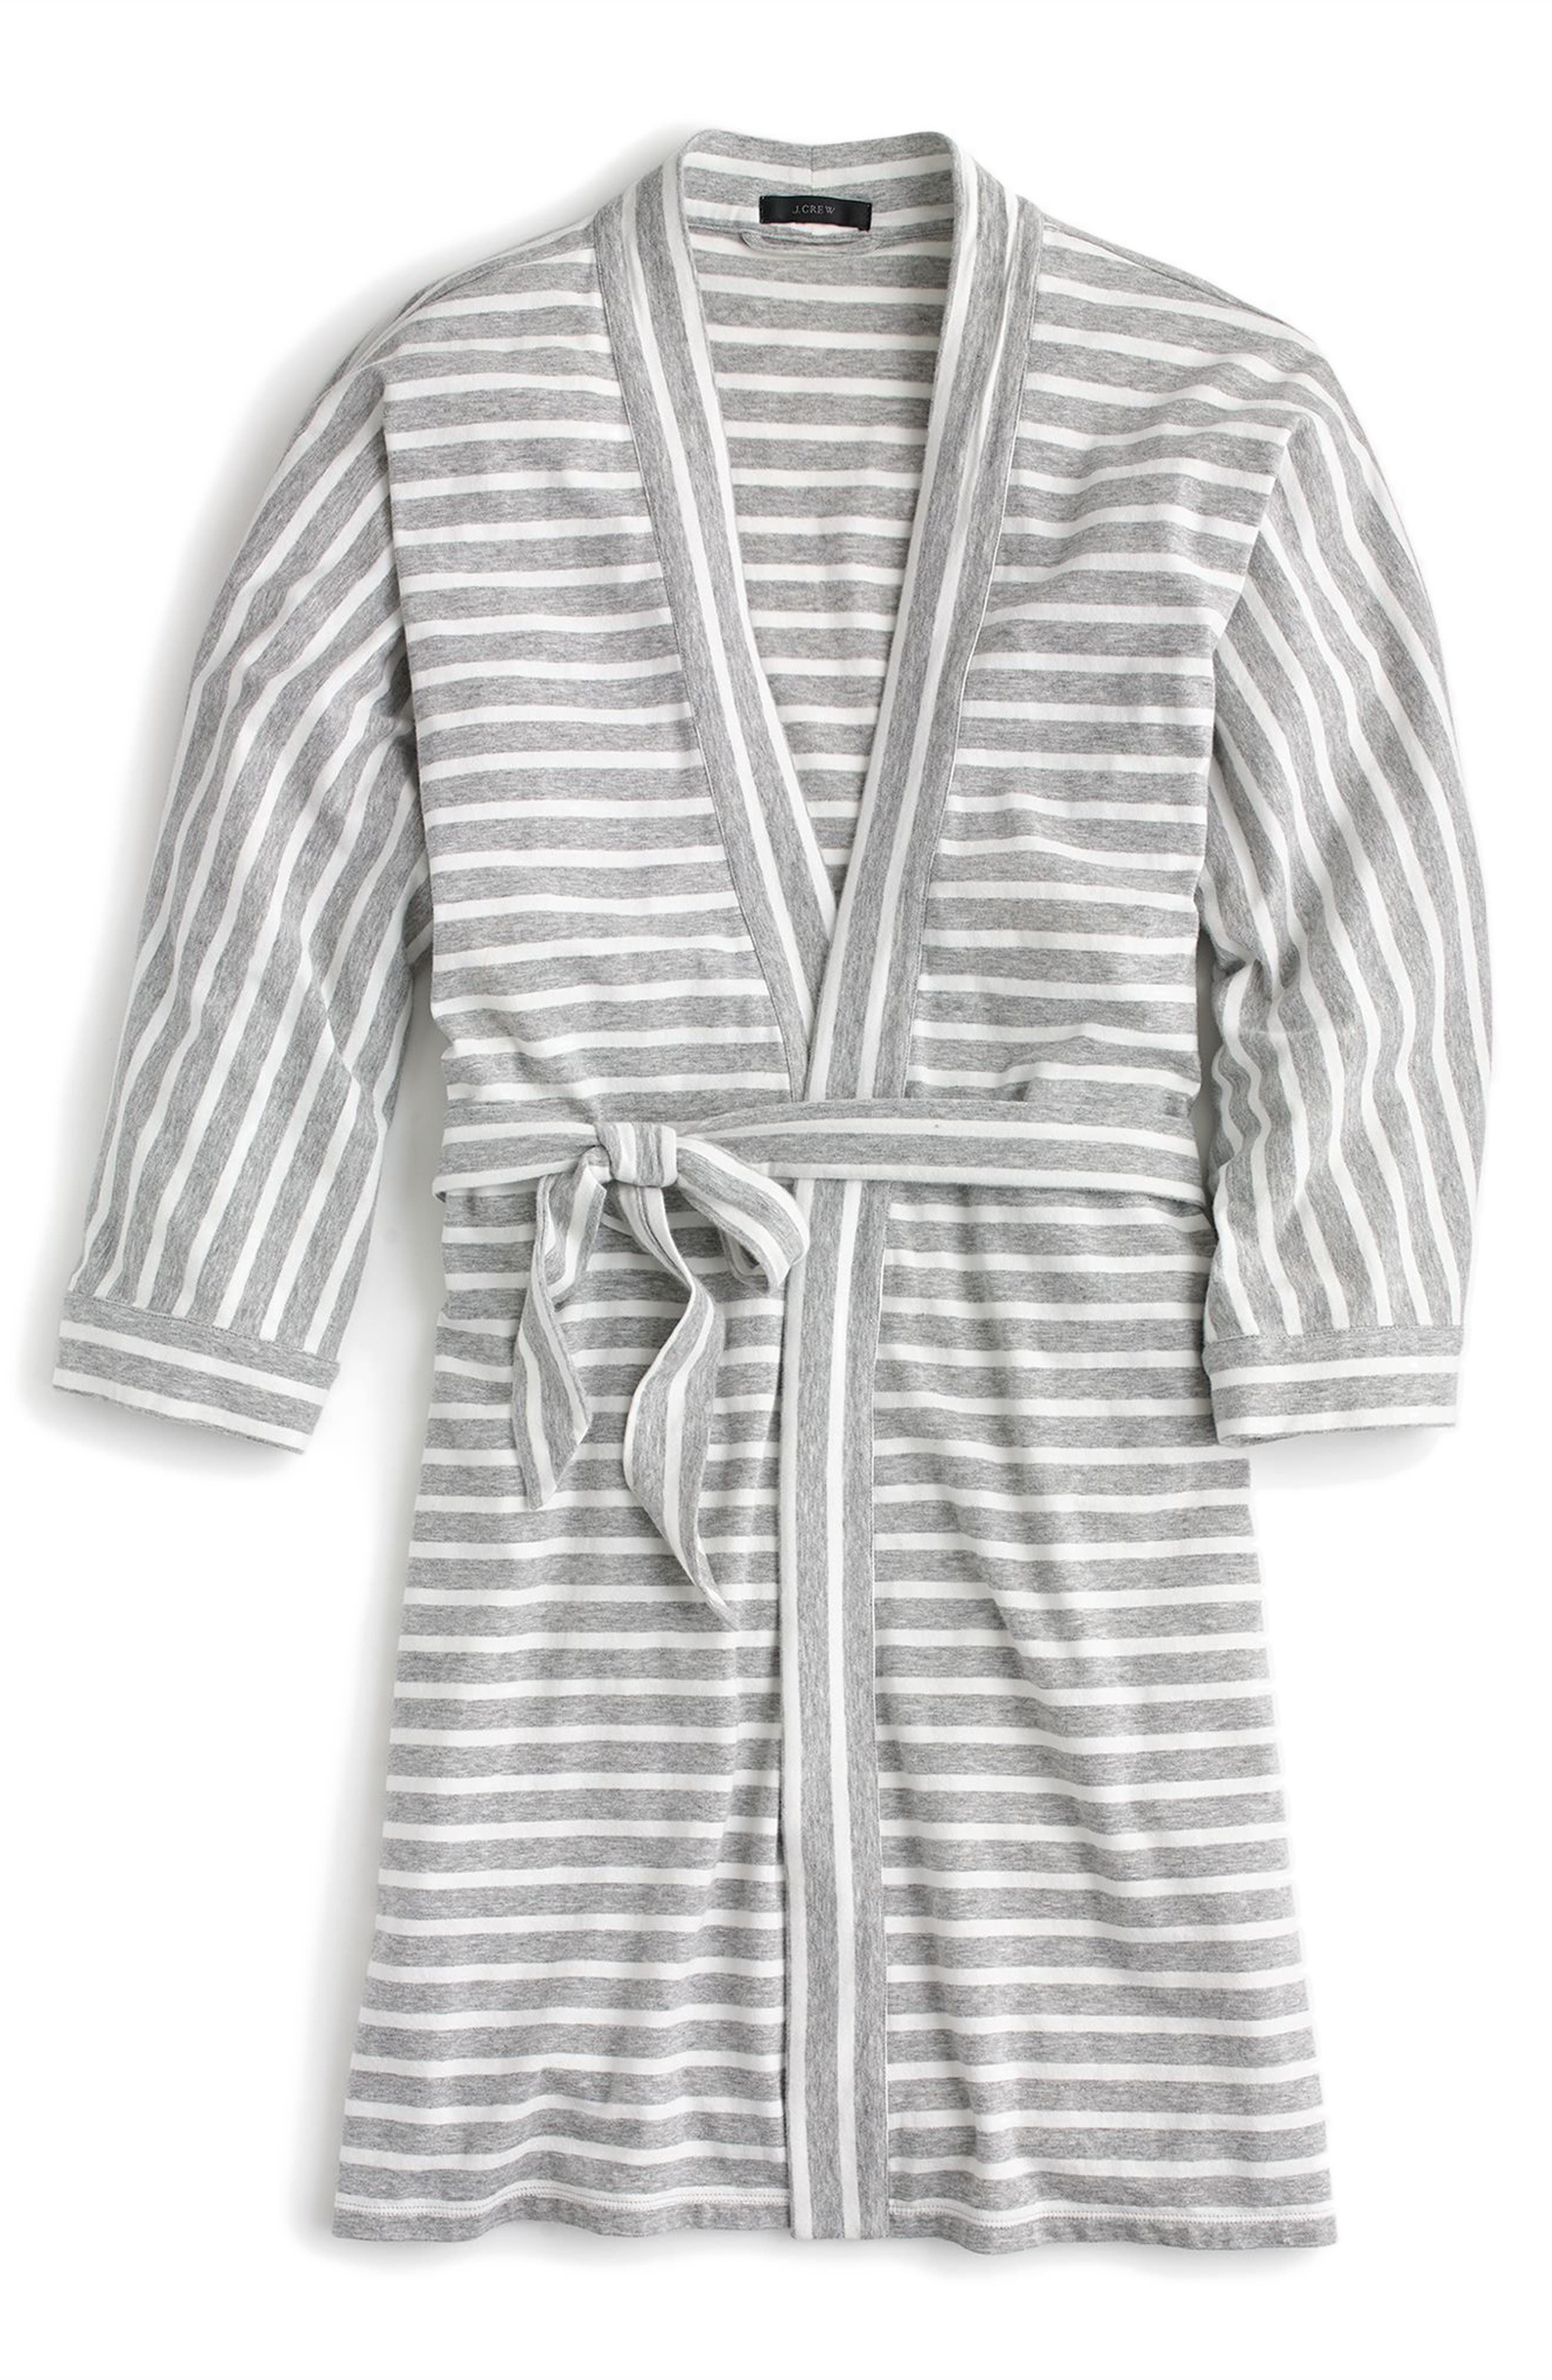 J.CREW,                             Stripe Stretch Cotton Robe,                             Alternate thumbnail 3, color,                             HTHR GRAY IVORY